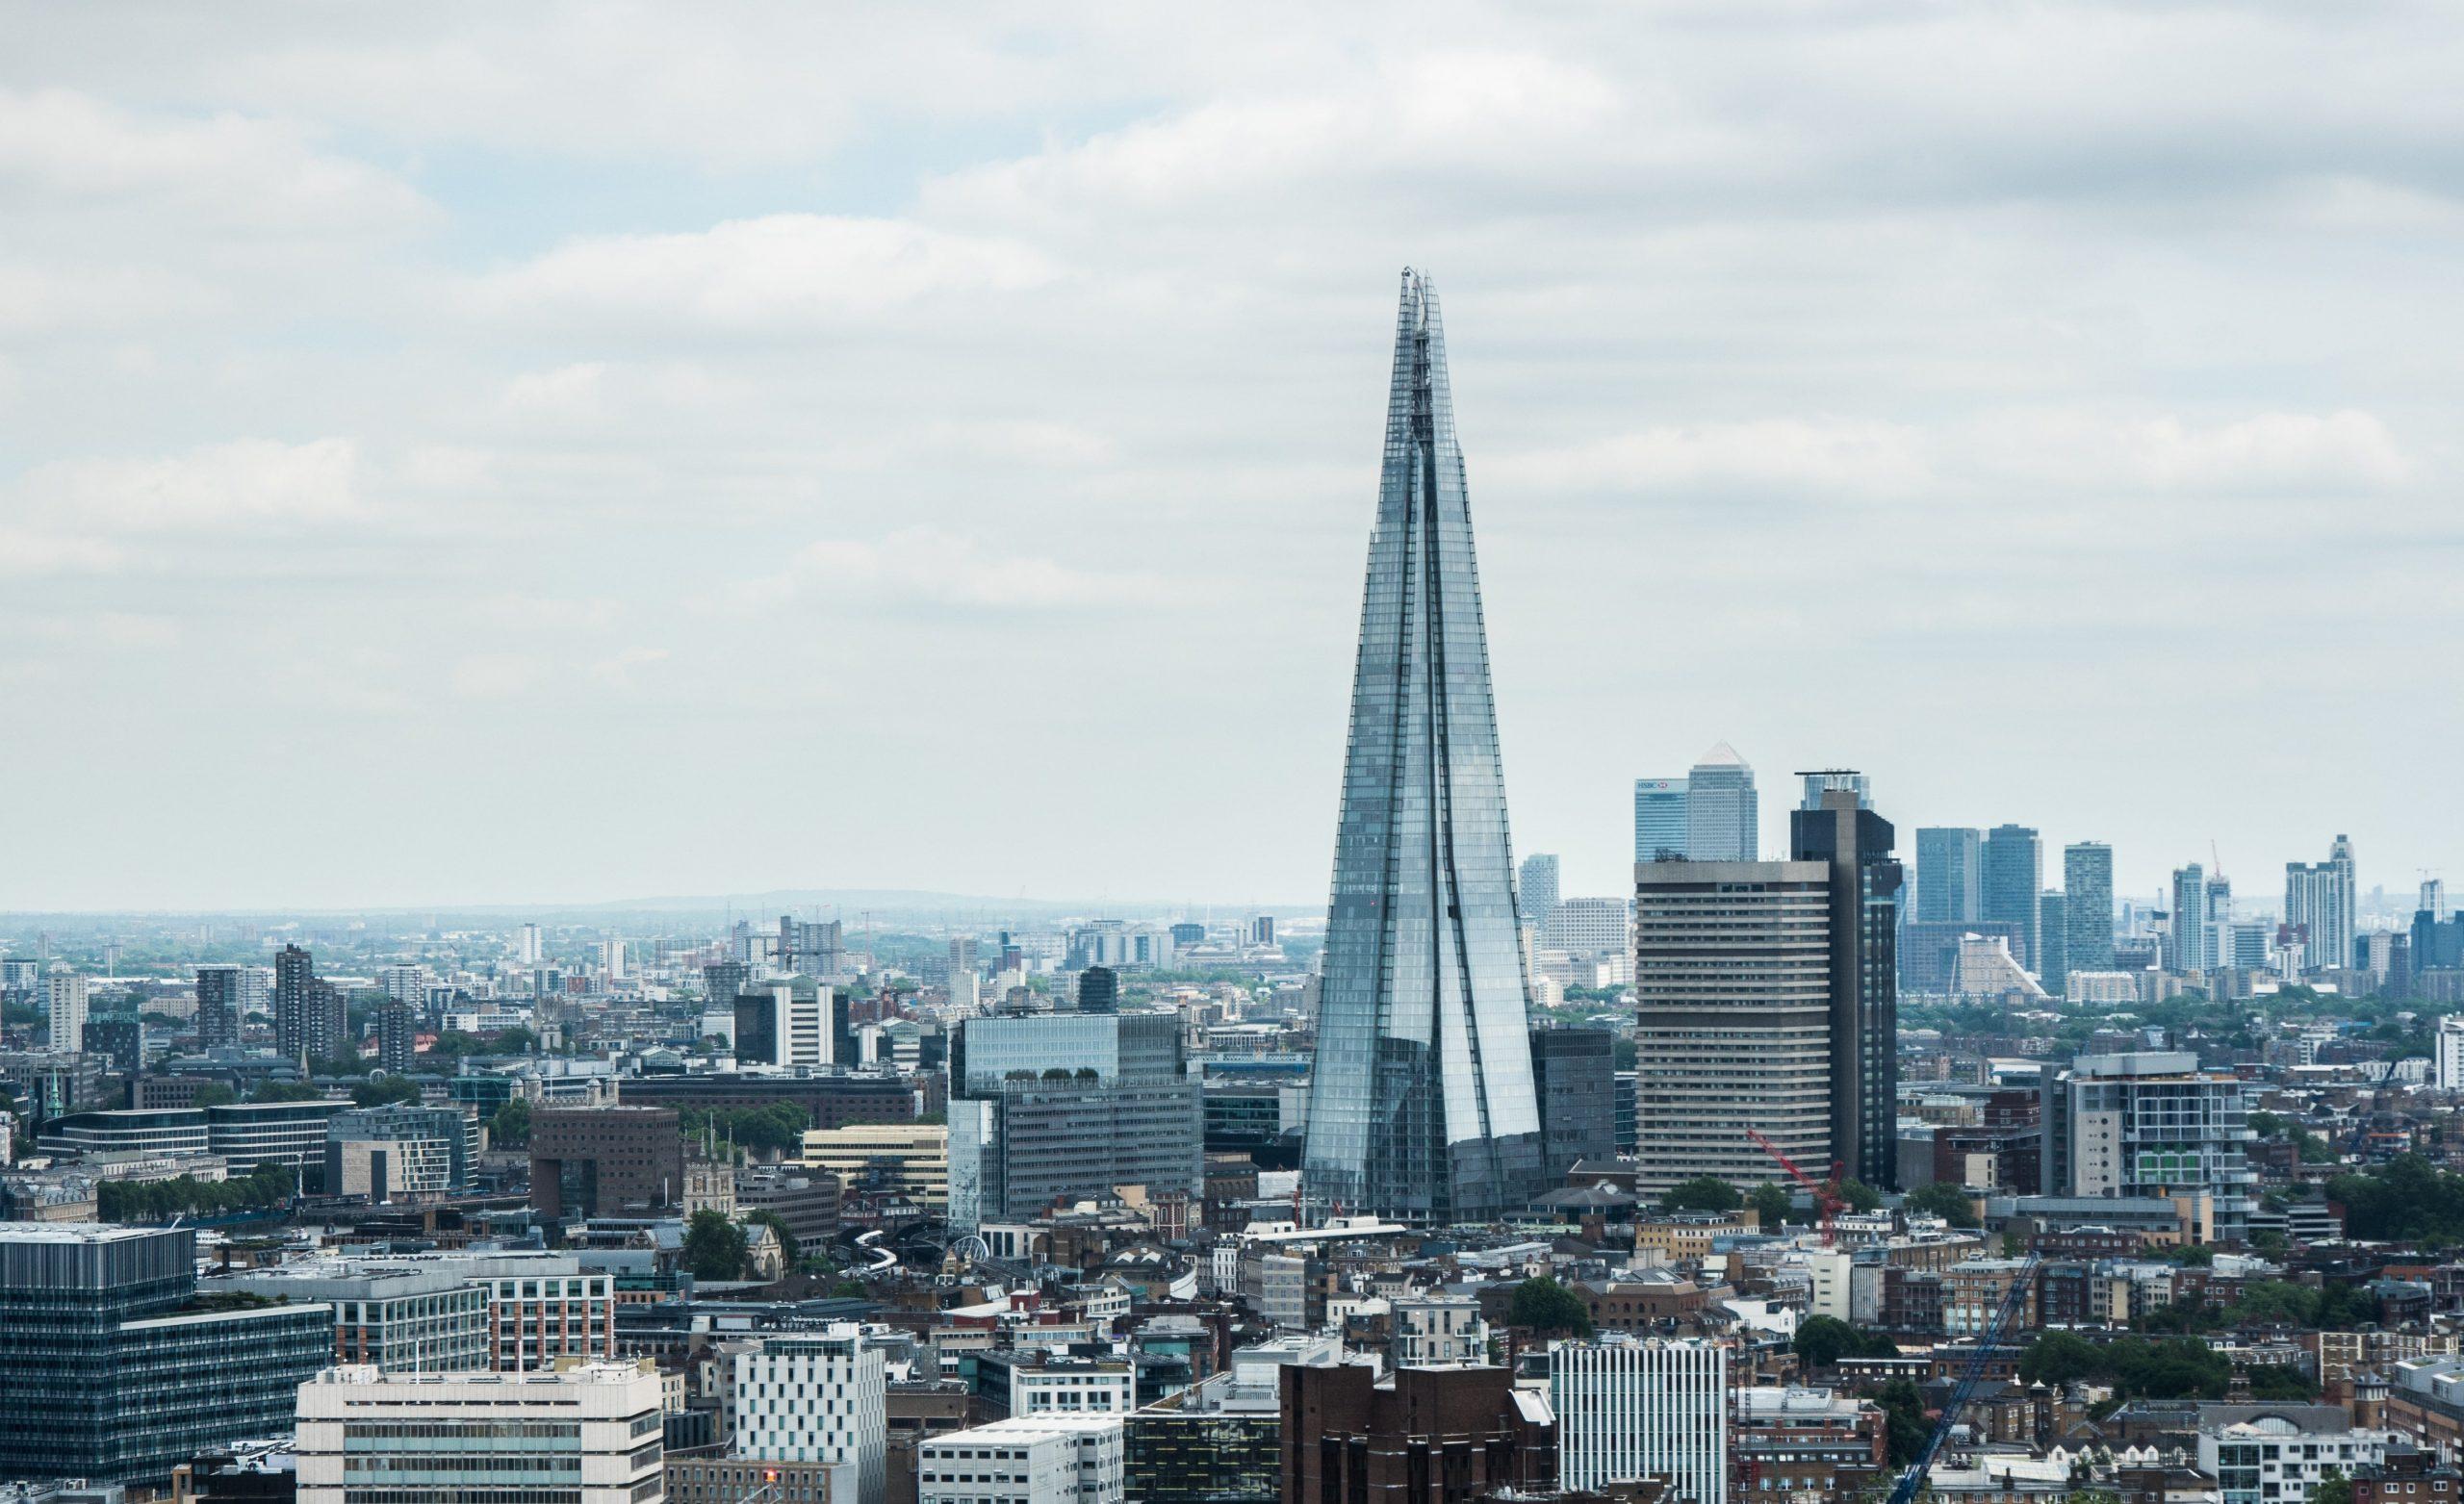 easiest universities to get into in London